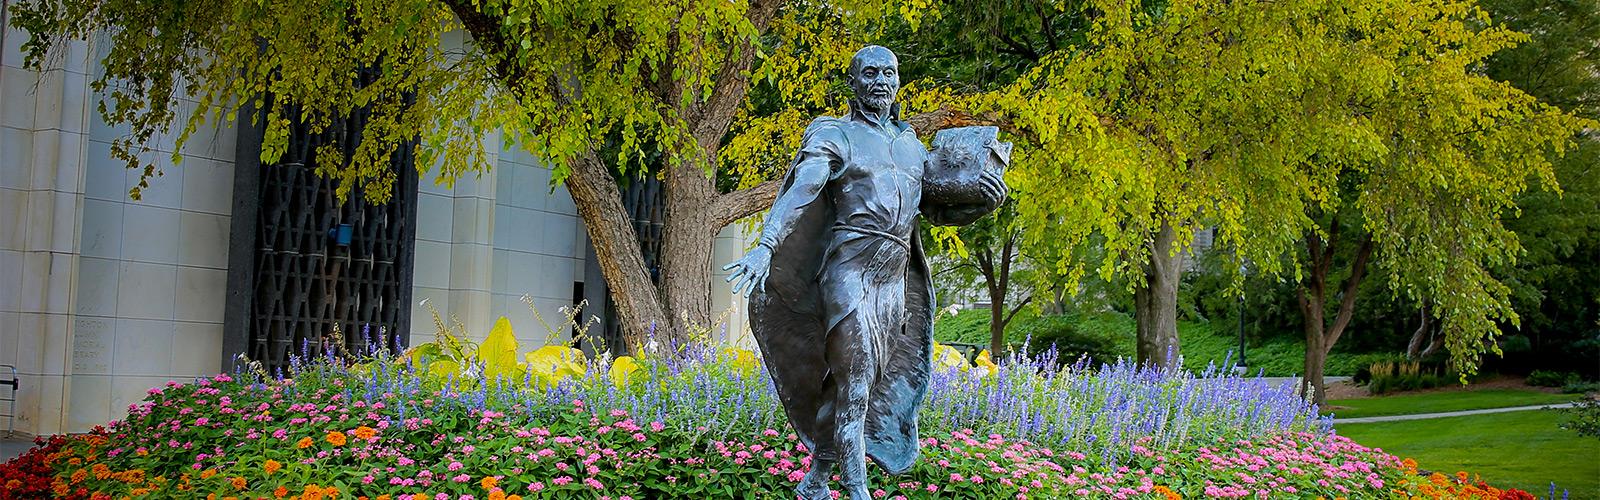 Ignatian Statue on Creighton University campus in Omaha, NE